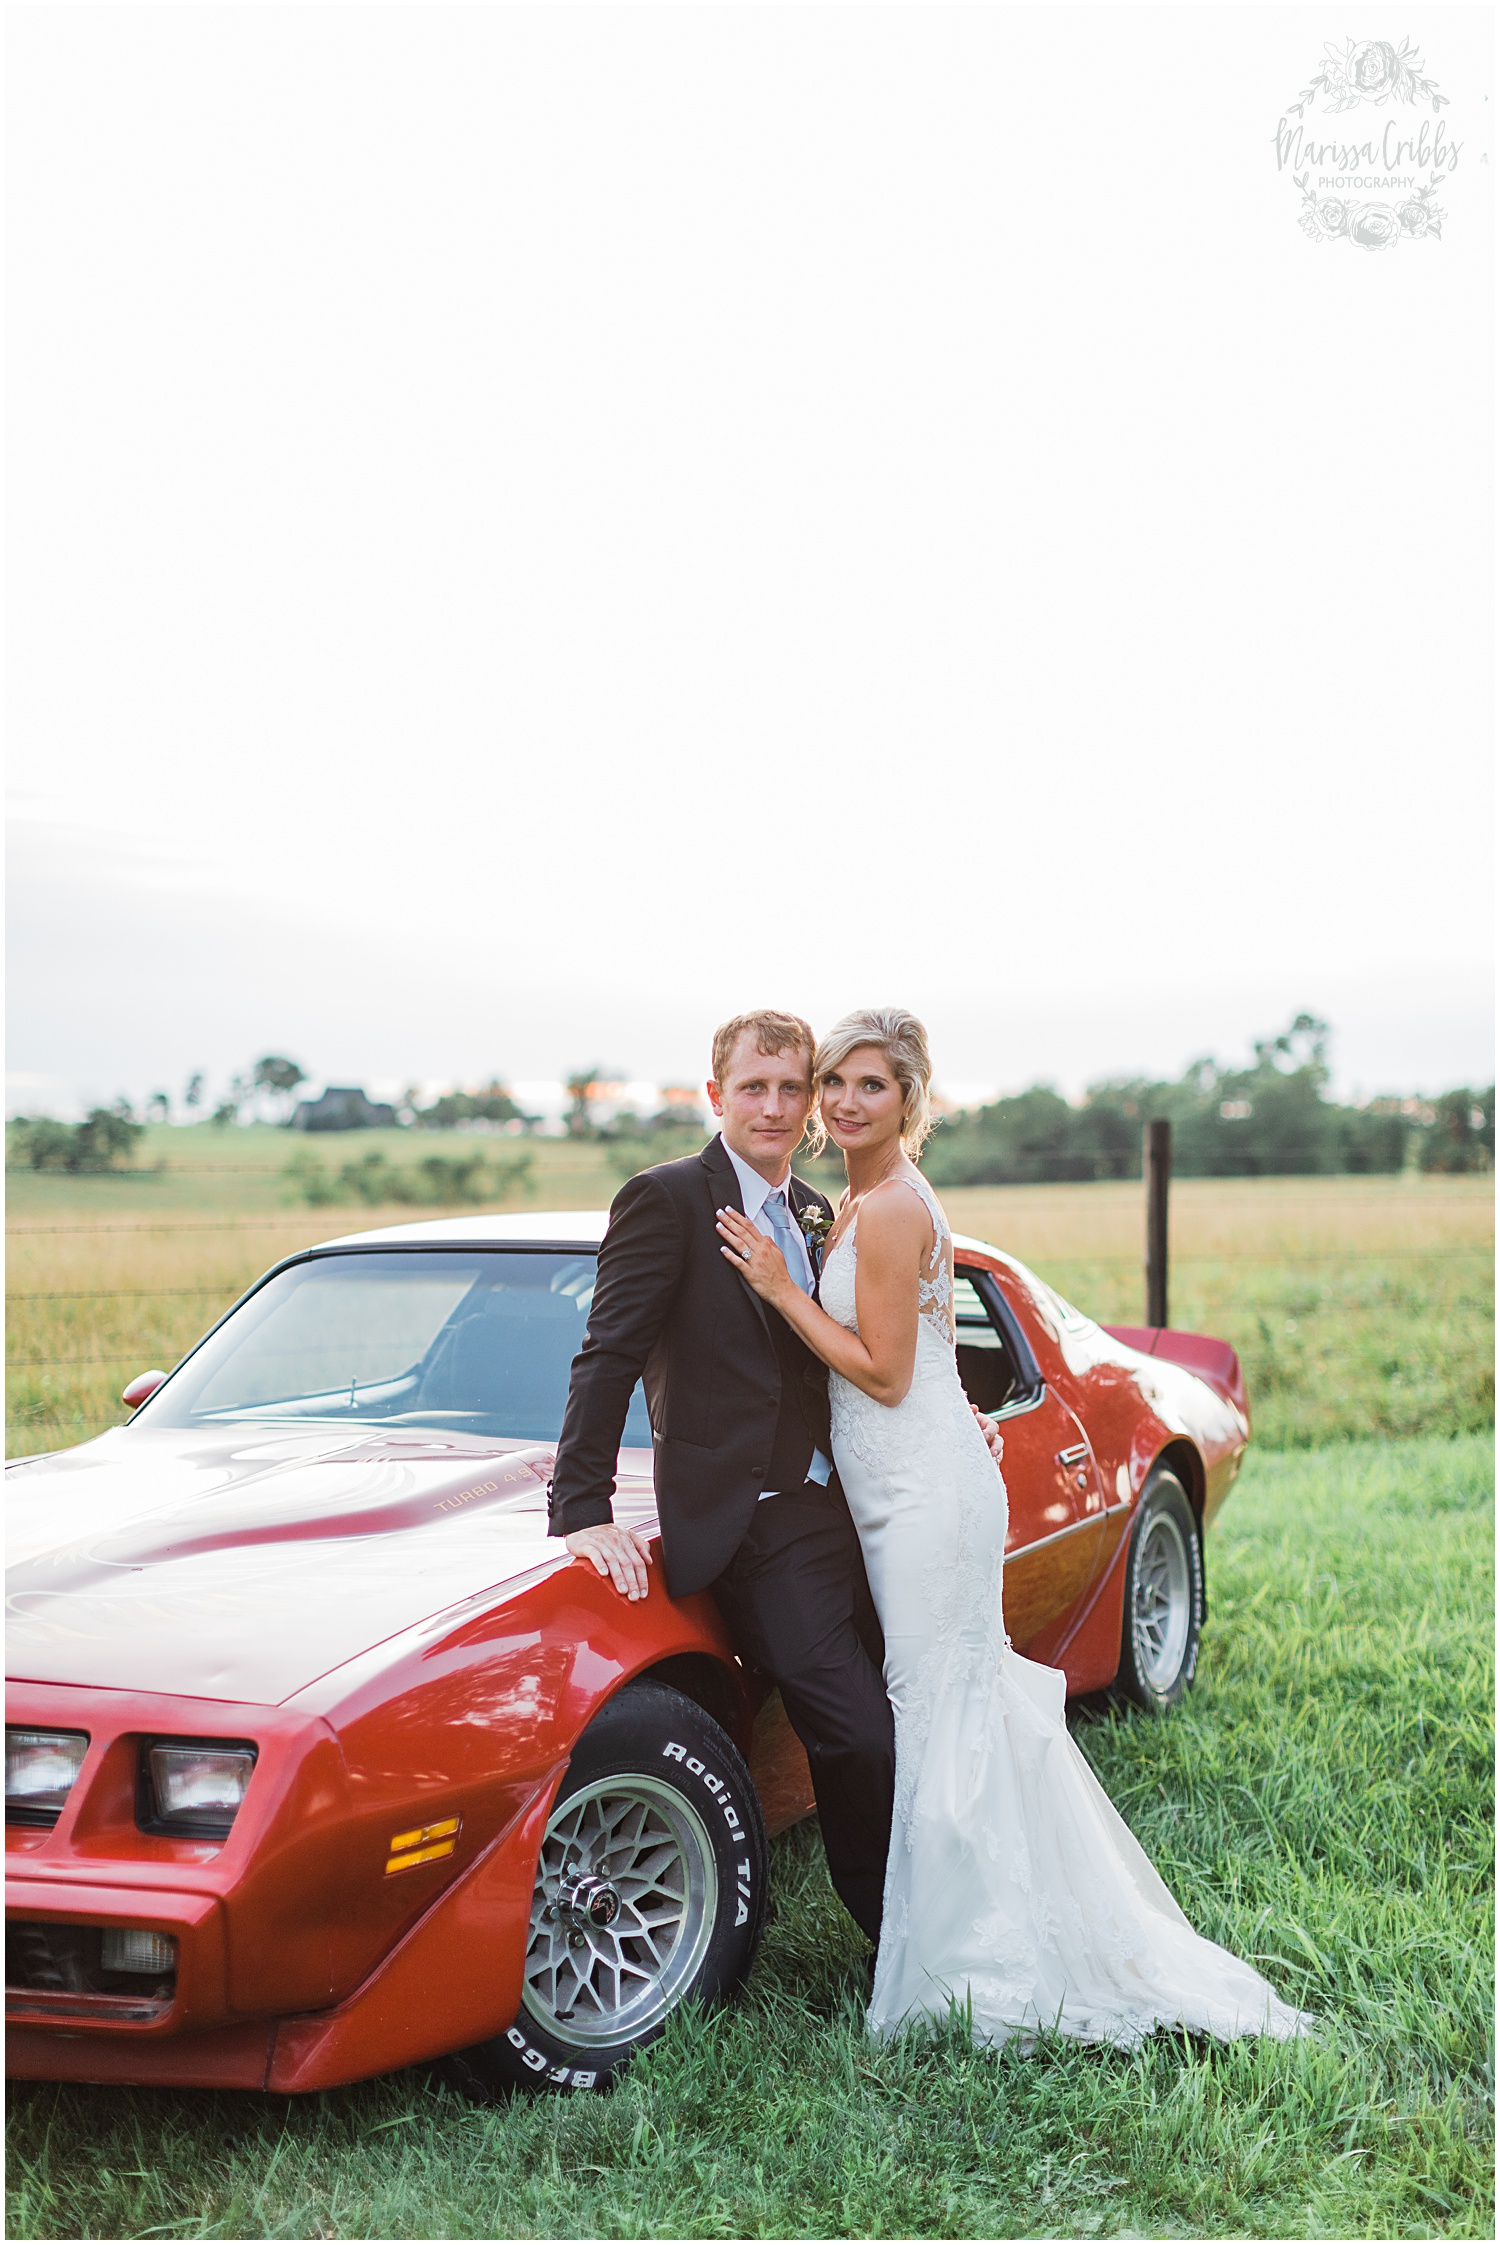 CHELSEA & BEN MARRIED BLOG  | MARISSA CRIBBS PHOTOGRAPHY_8634.jpg